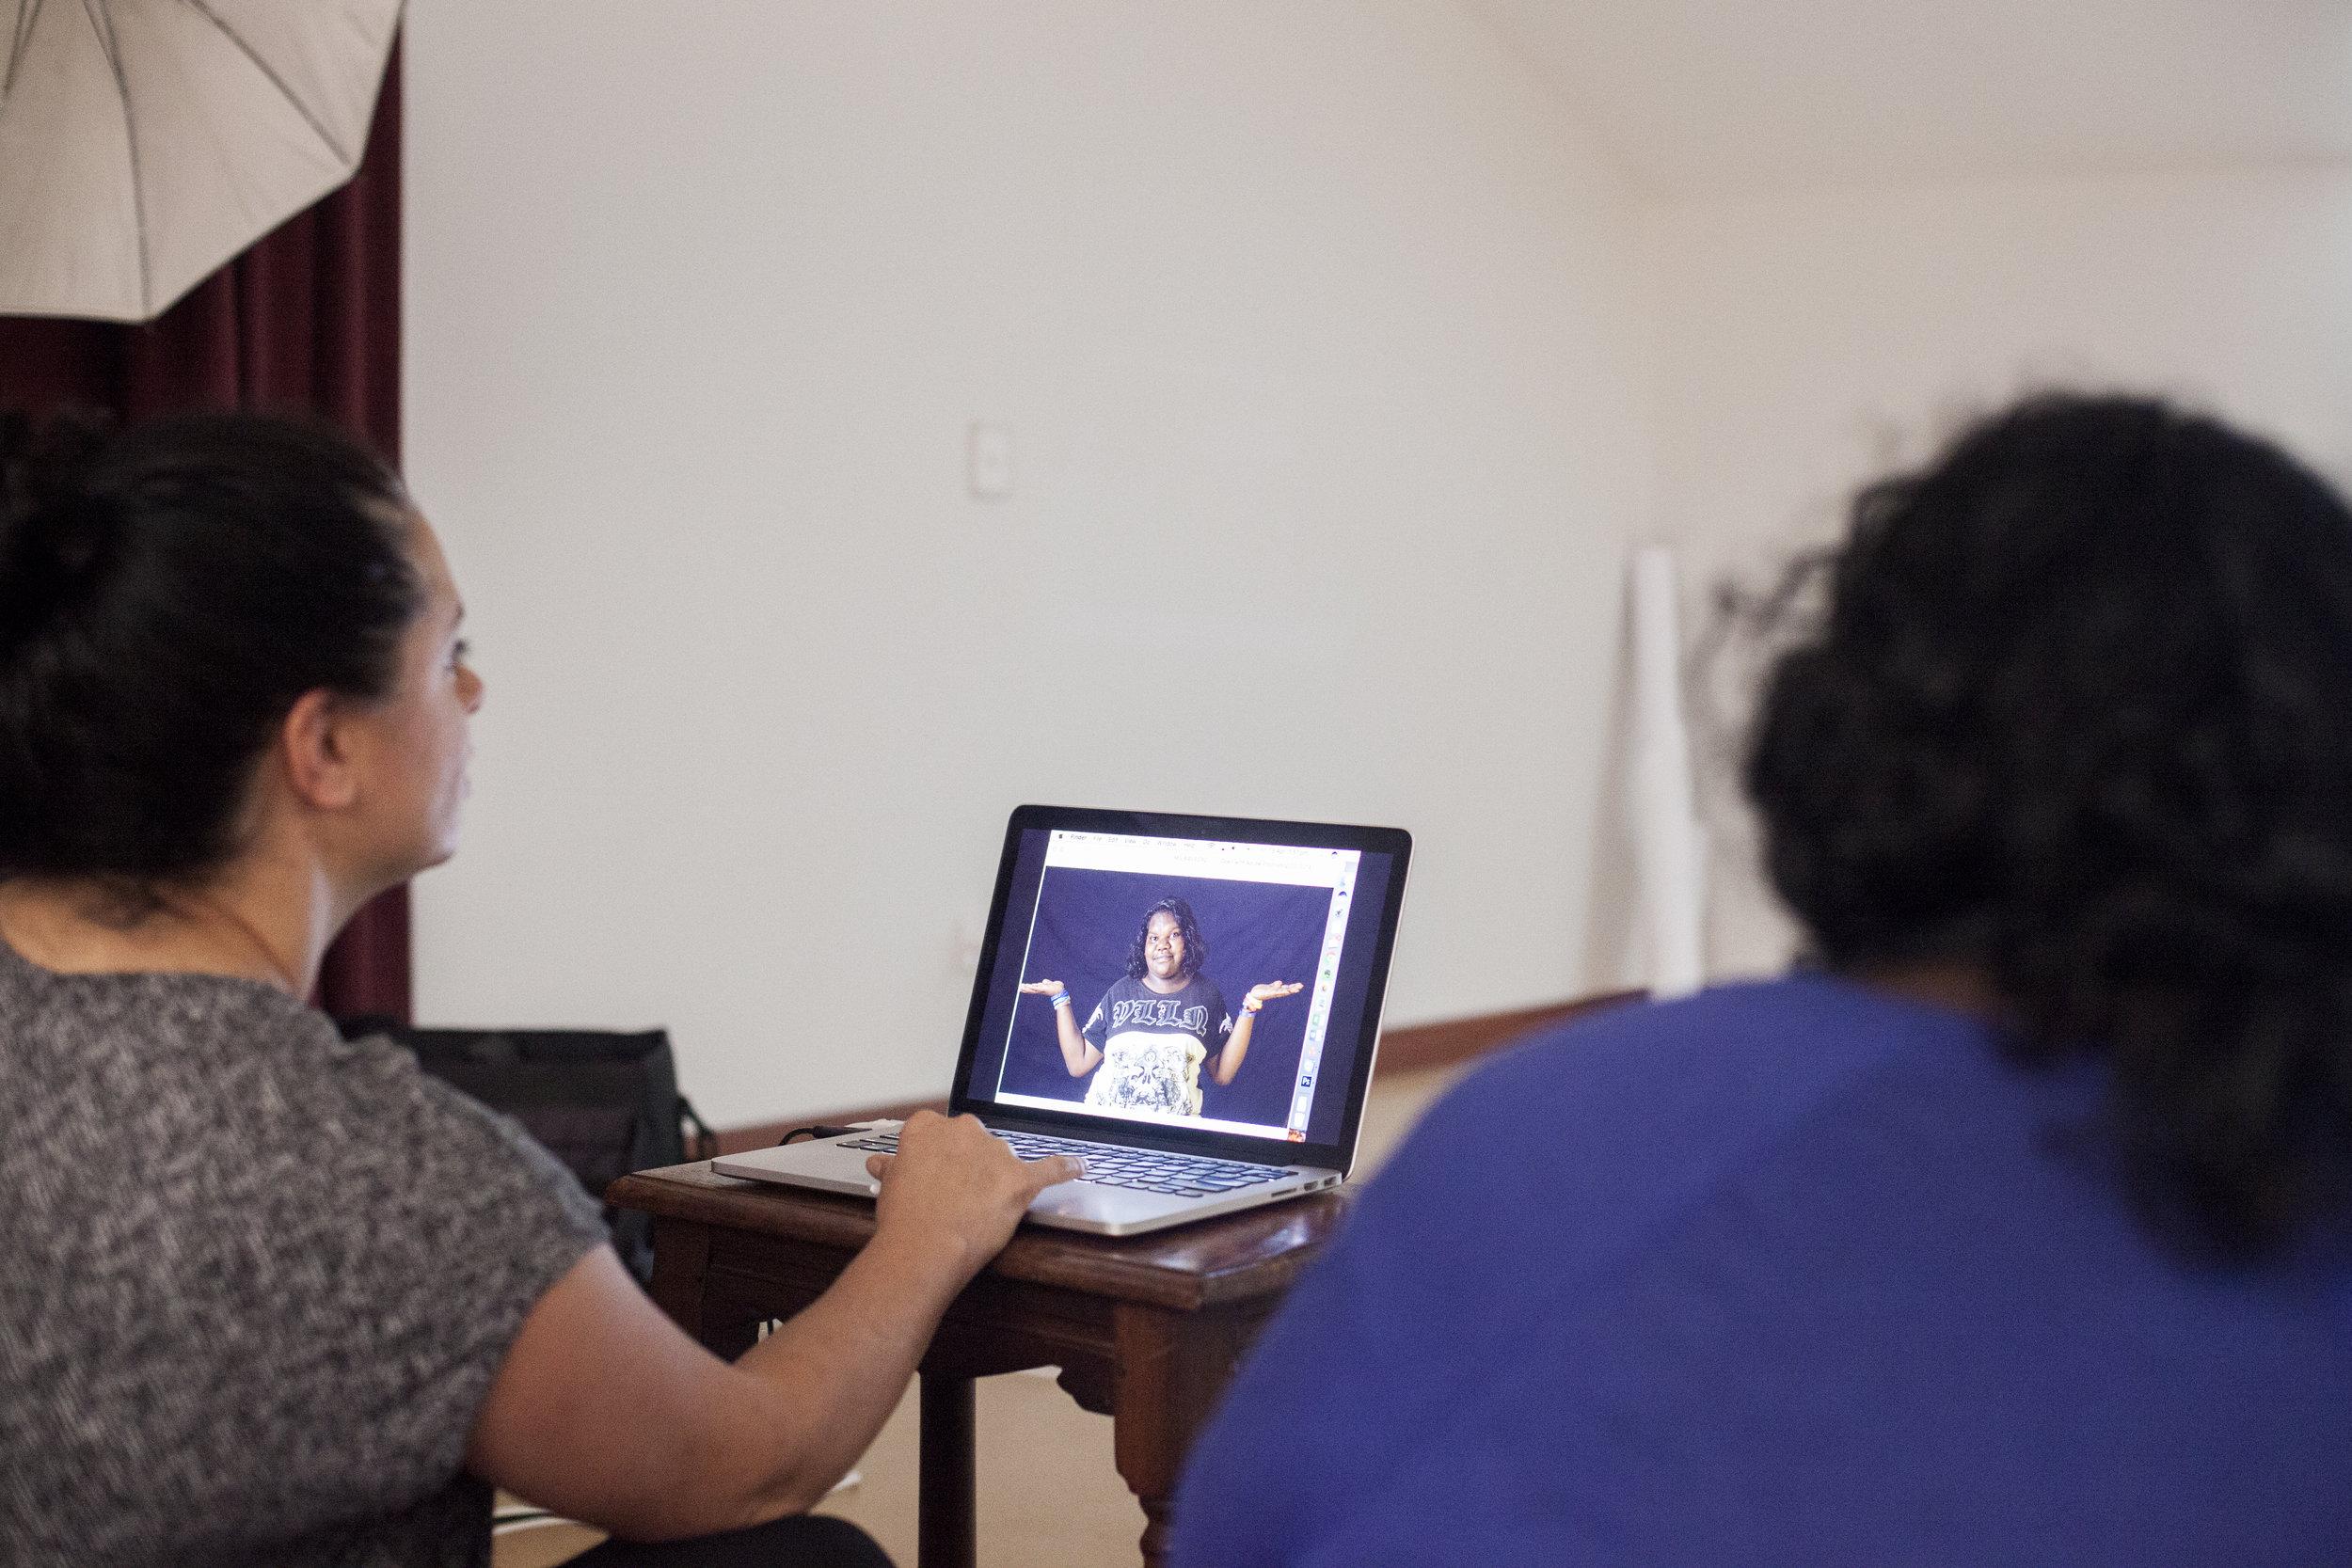 Maria Fredericks and Christine Tomas reviewing and editing studio portraits.